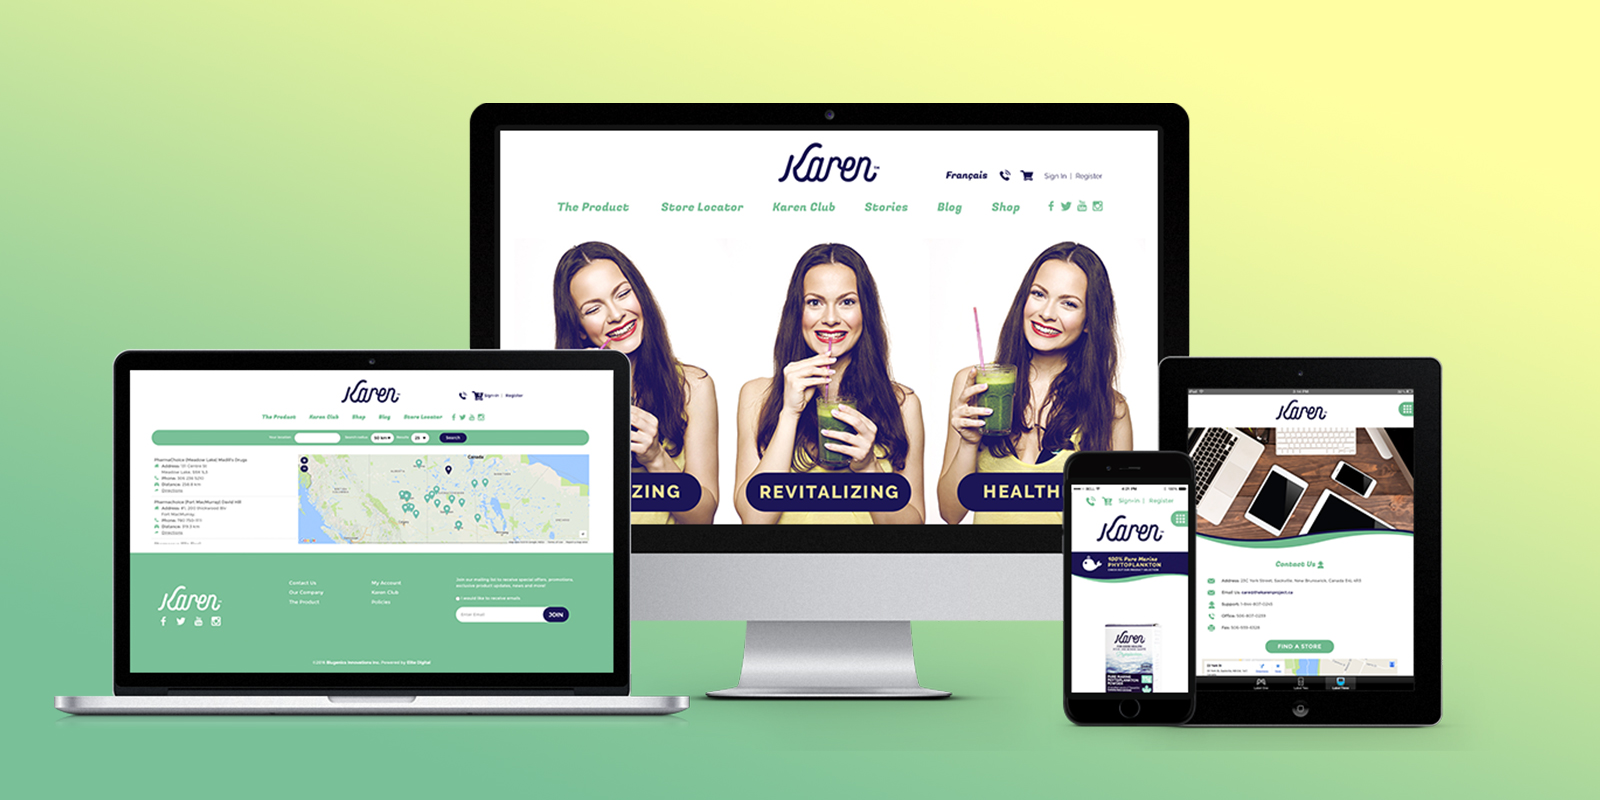 Karen website on different devices